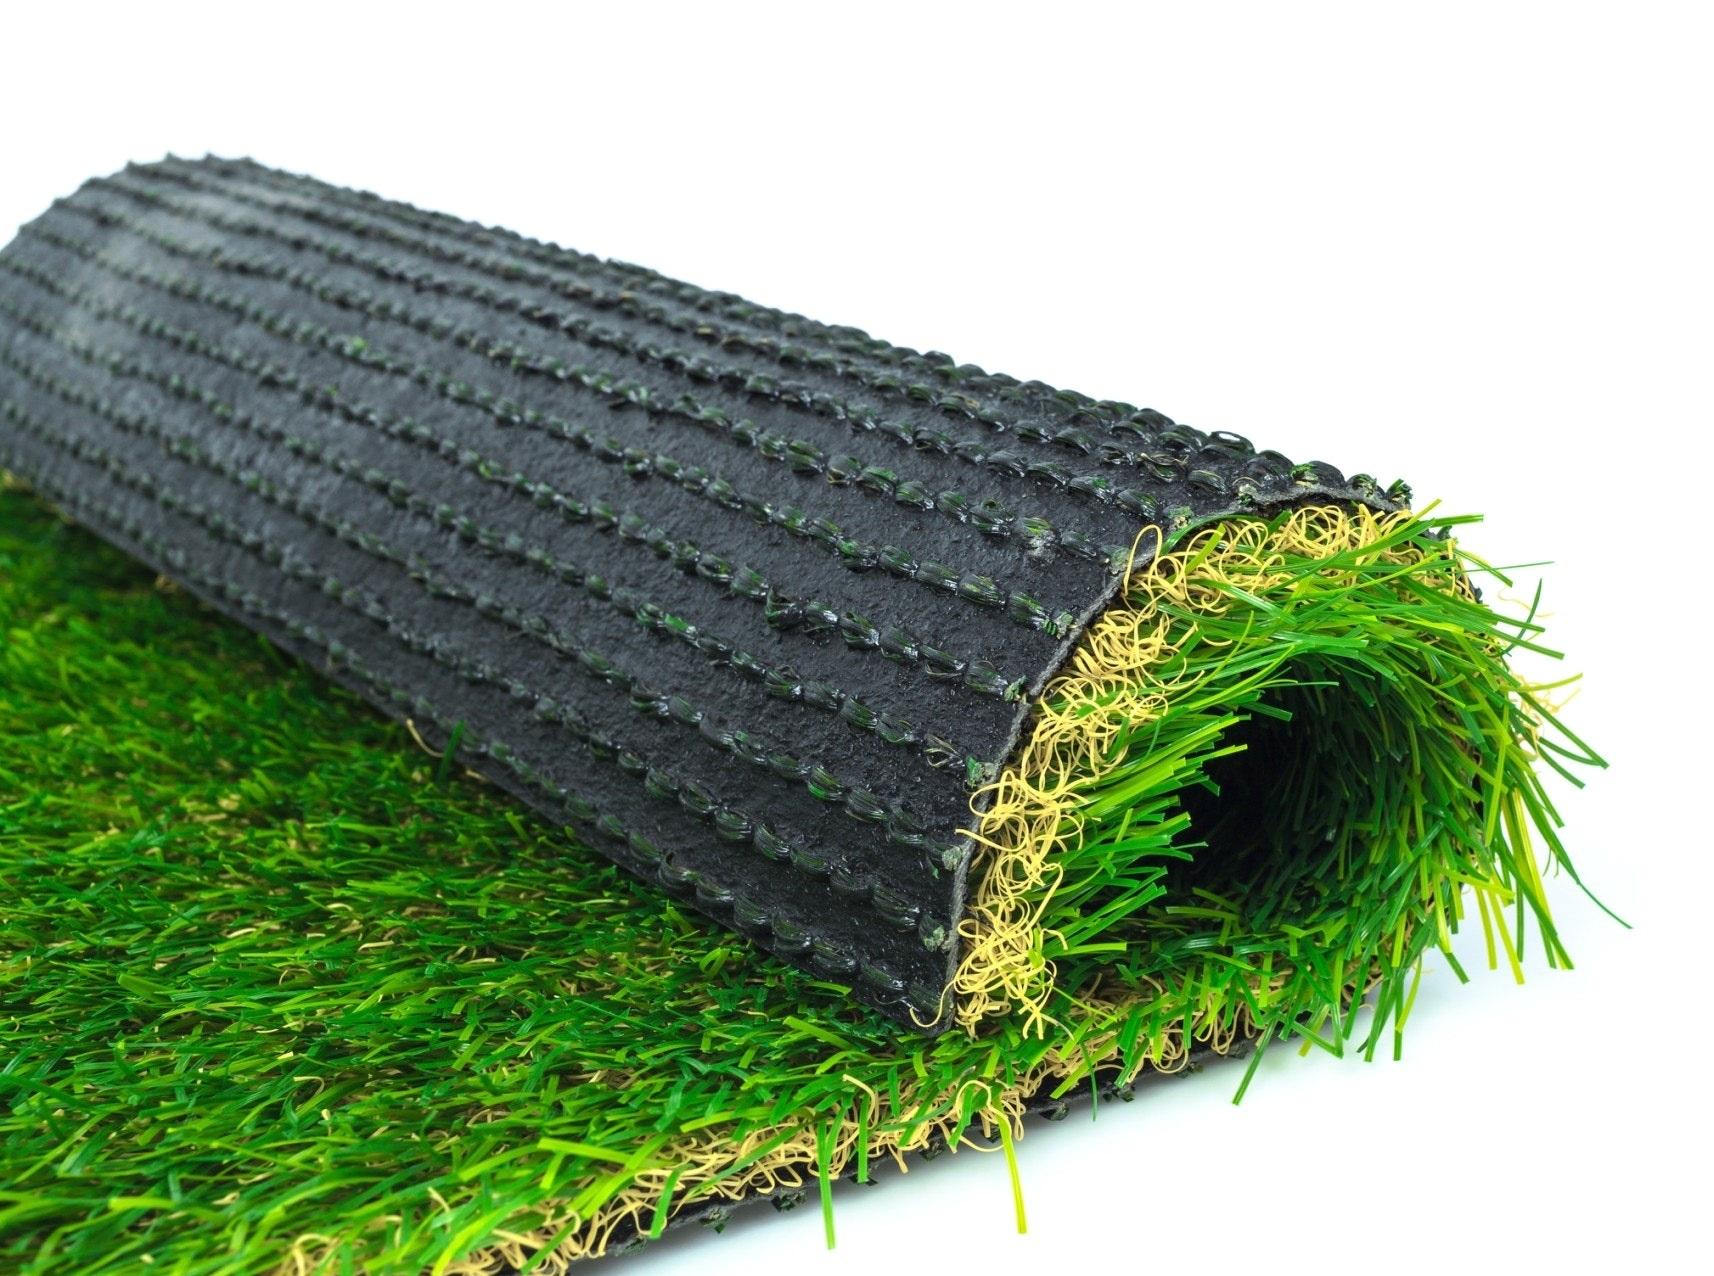 constructing artificial turfs manufacturers artificiel. Black Bedroom Furniture Sets. Home Design Ideas